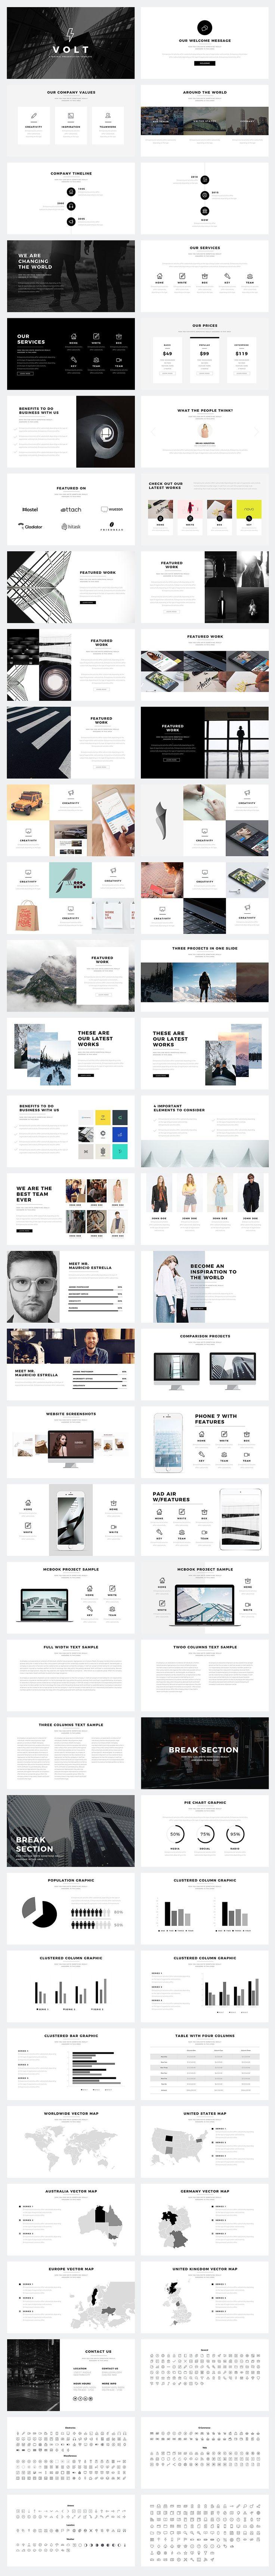 Volt Minimal PowerPoint Template by SlidePro on @creativemarket